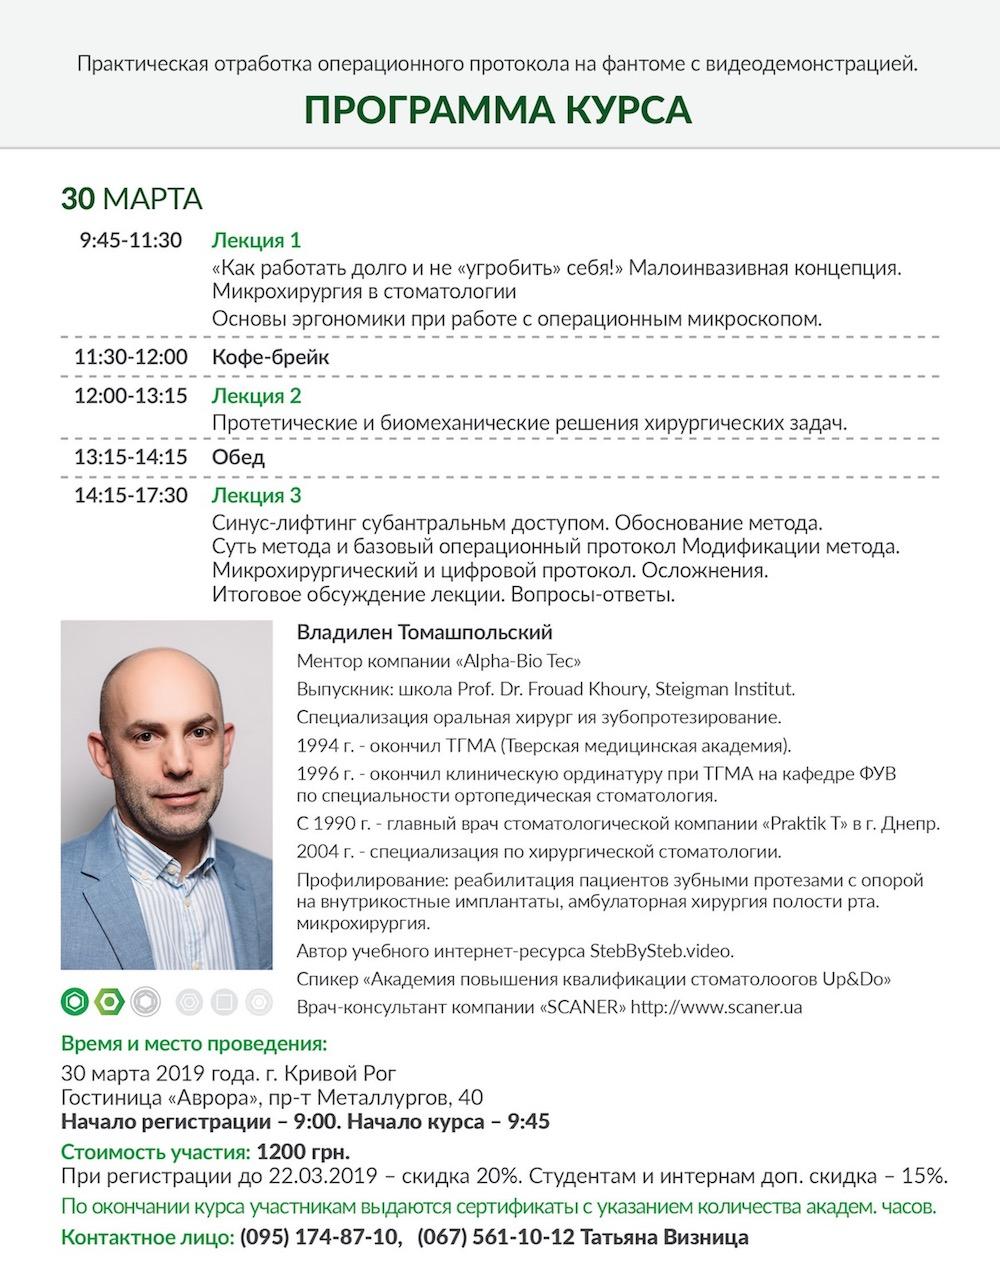 Аугментация дна. Владилен Томашпольский